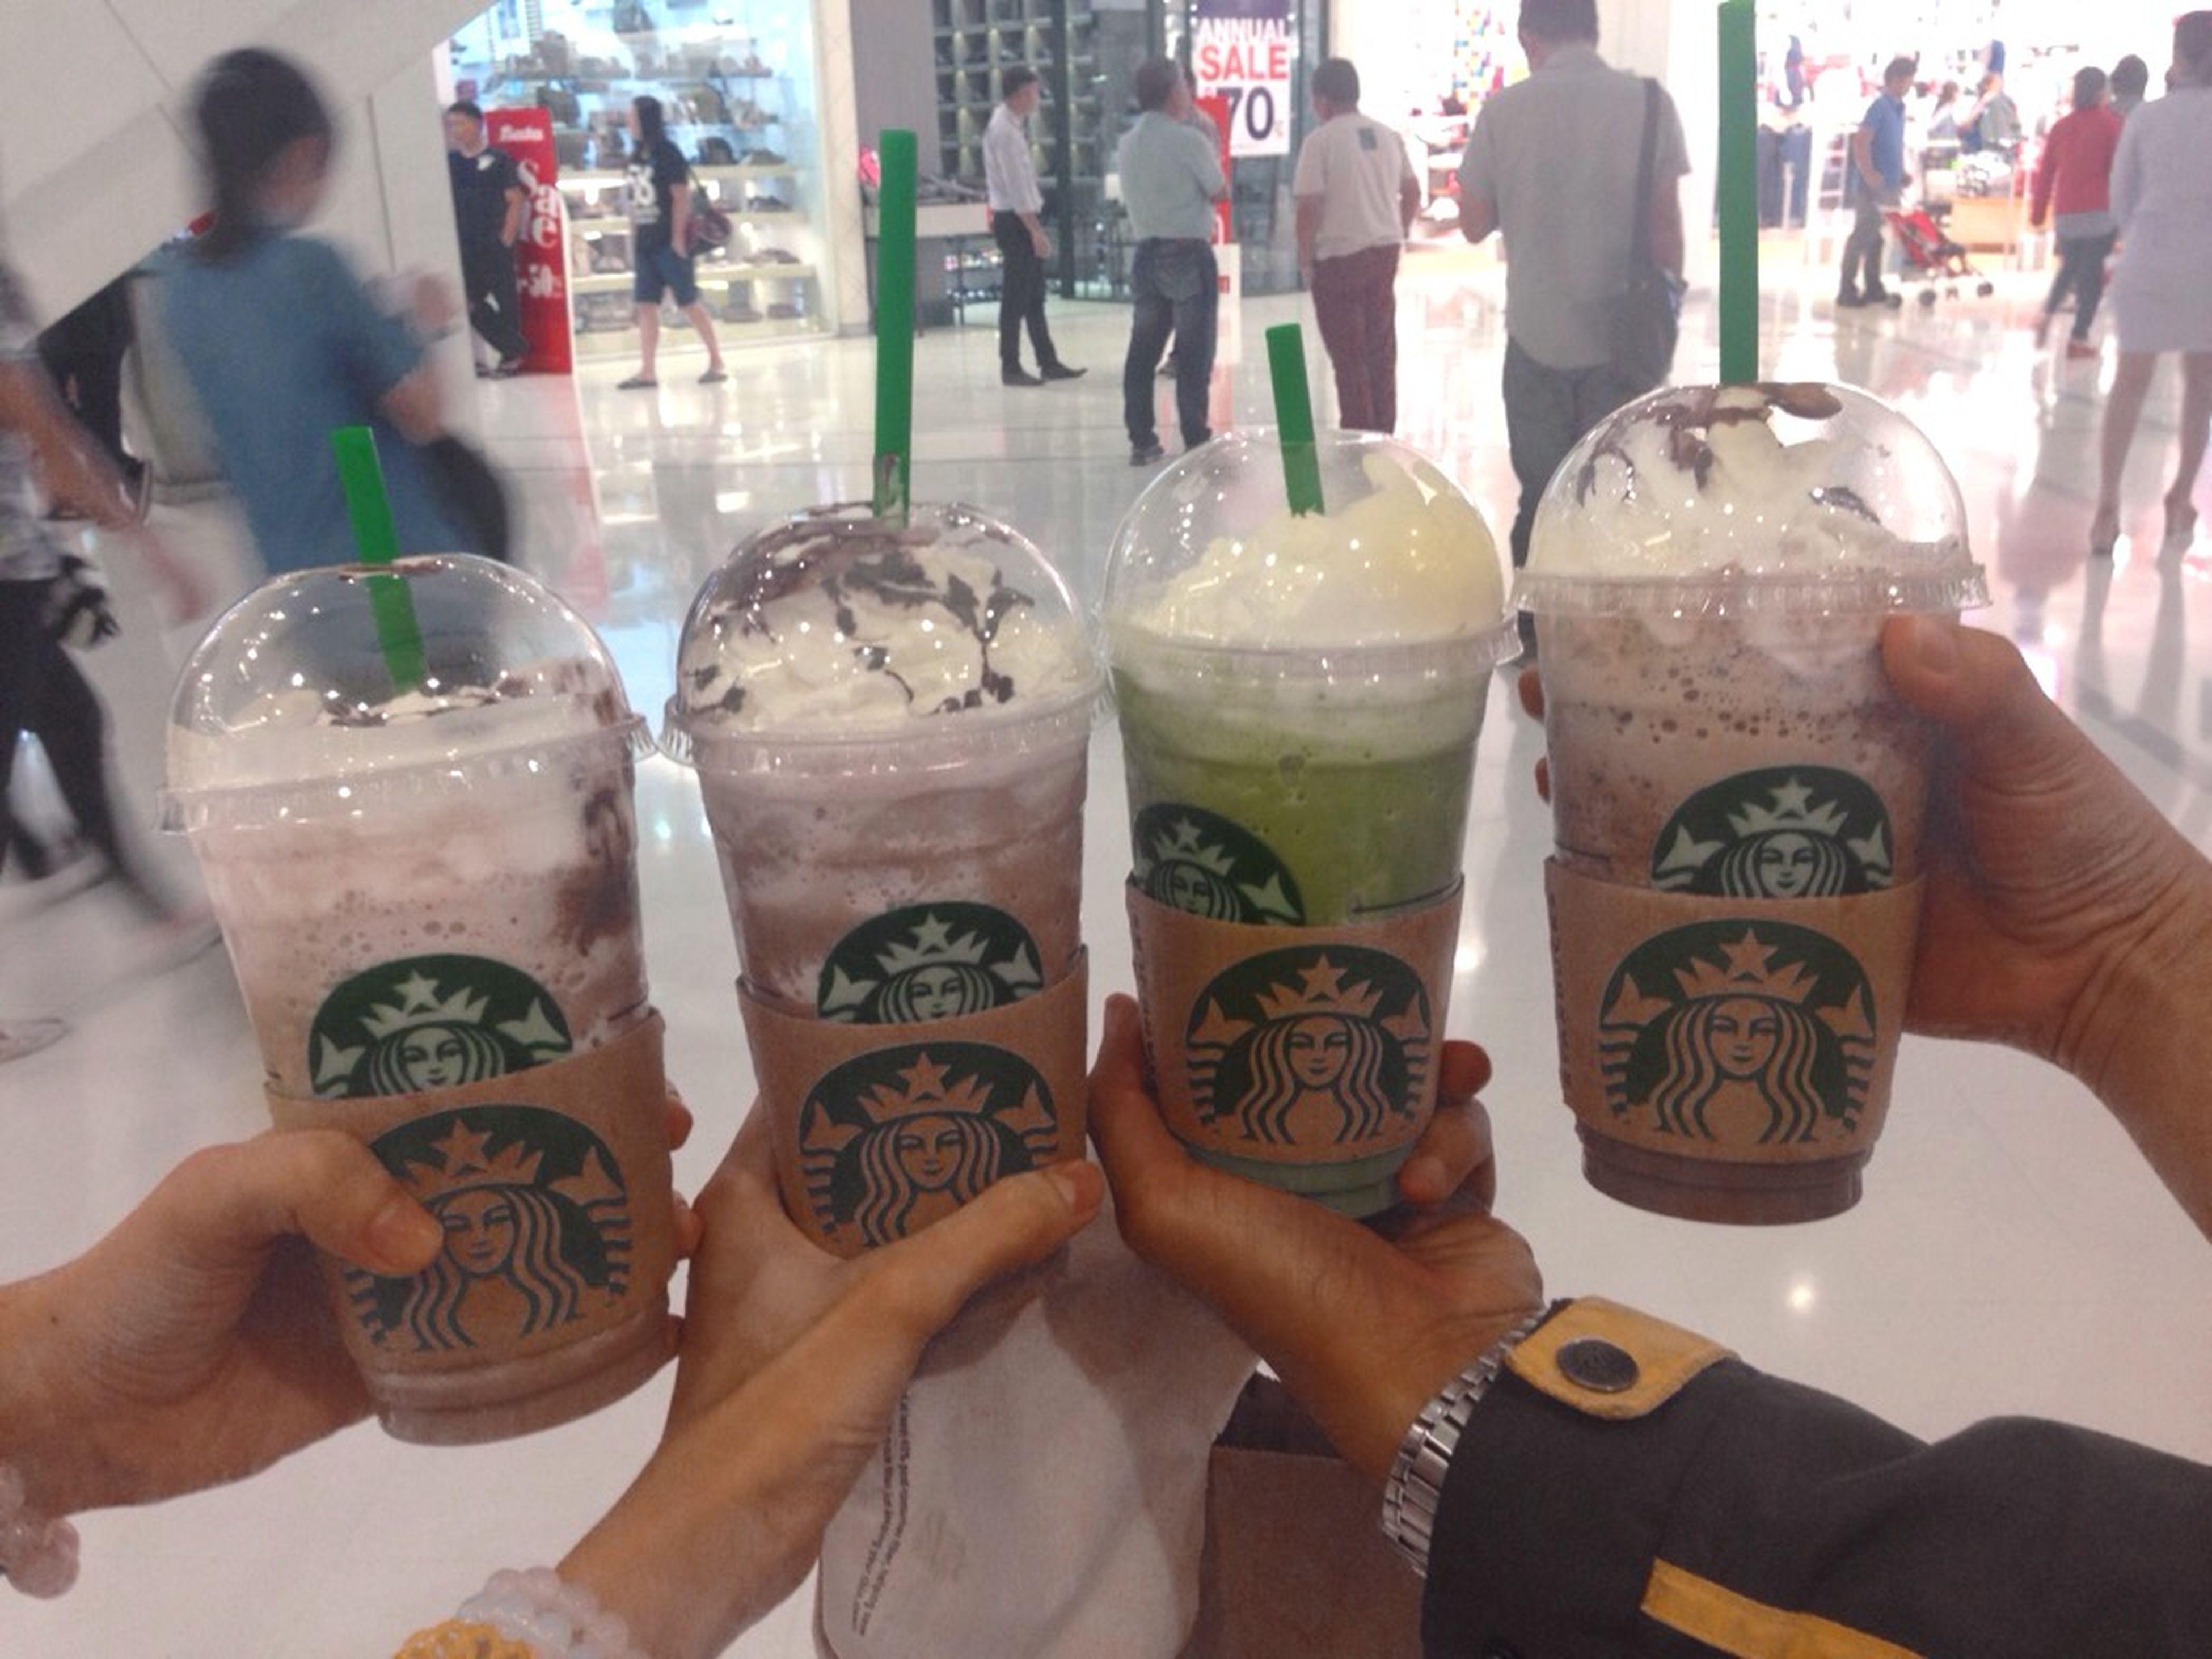 Starbucks Enjoying Life Mcafetime Khonkaen Cafe Time Starbucksthailand Javachipfrappucino Greenteafrappuccino Chocolatecreamfrappucino